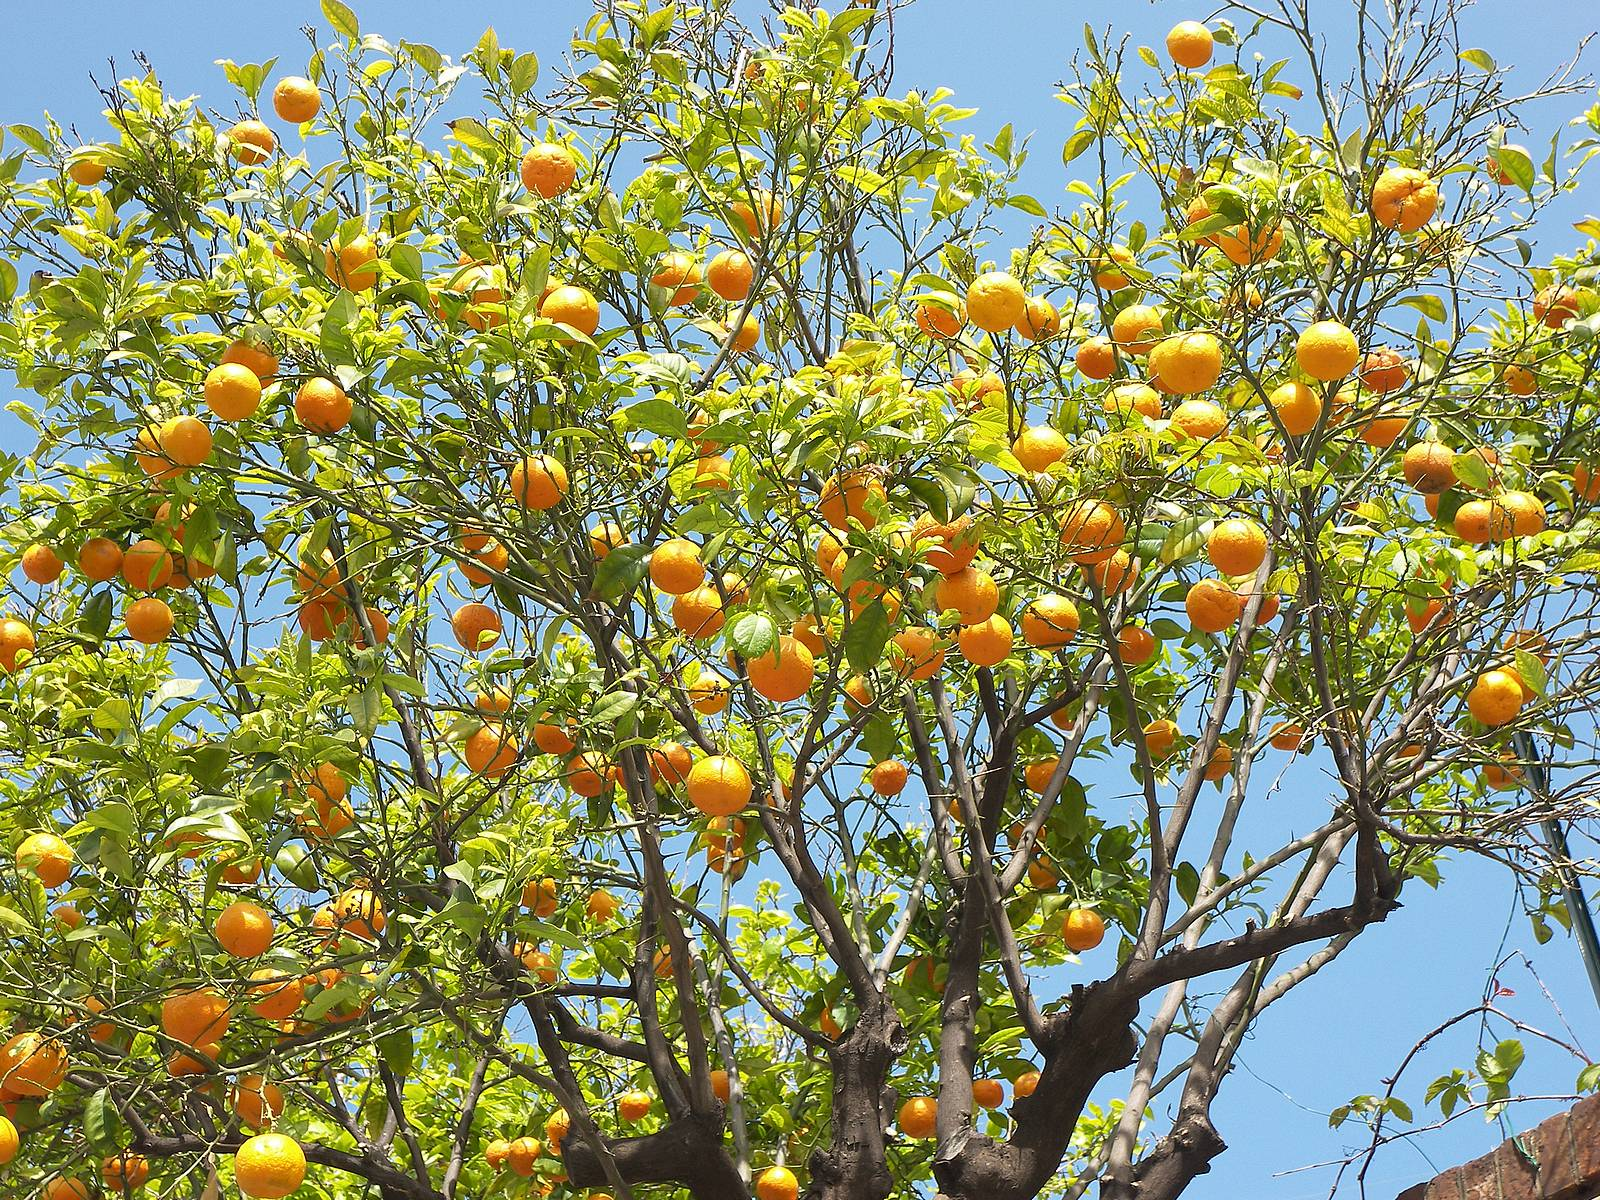 Orange Fruit And Candies: INFIRMATION ABOUT ORANGE FRUIT